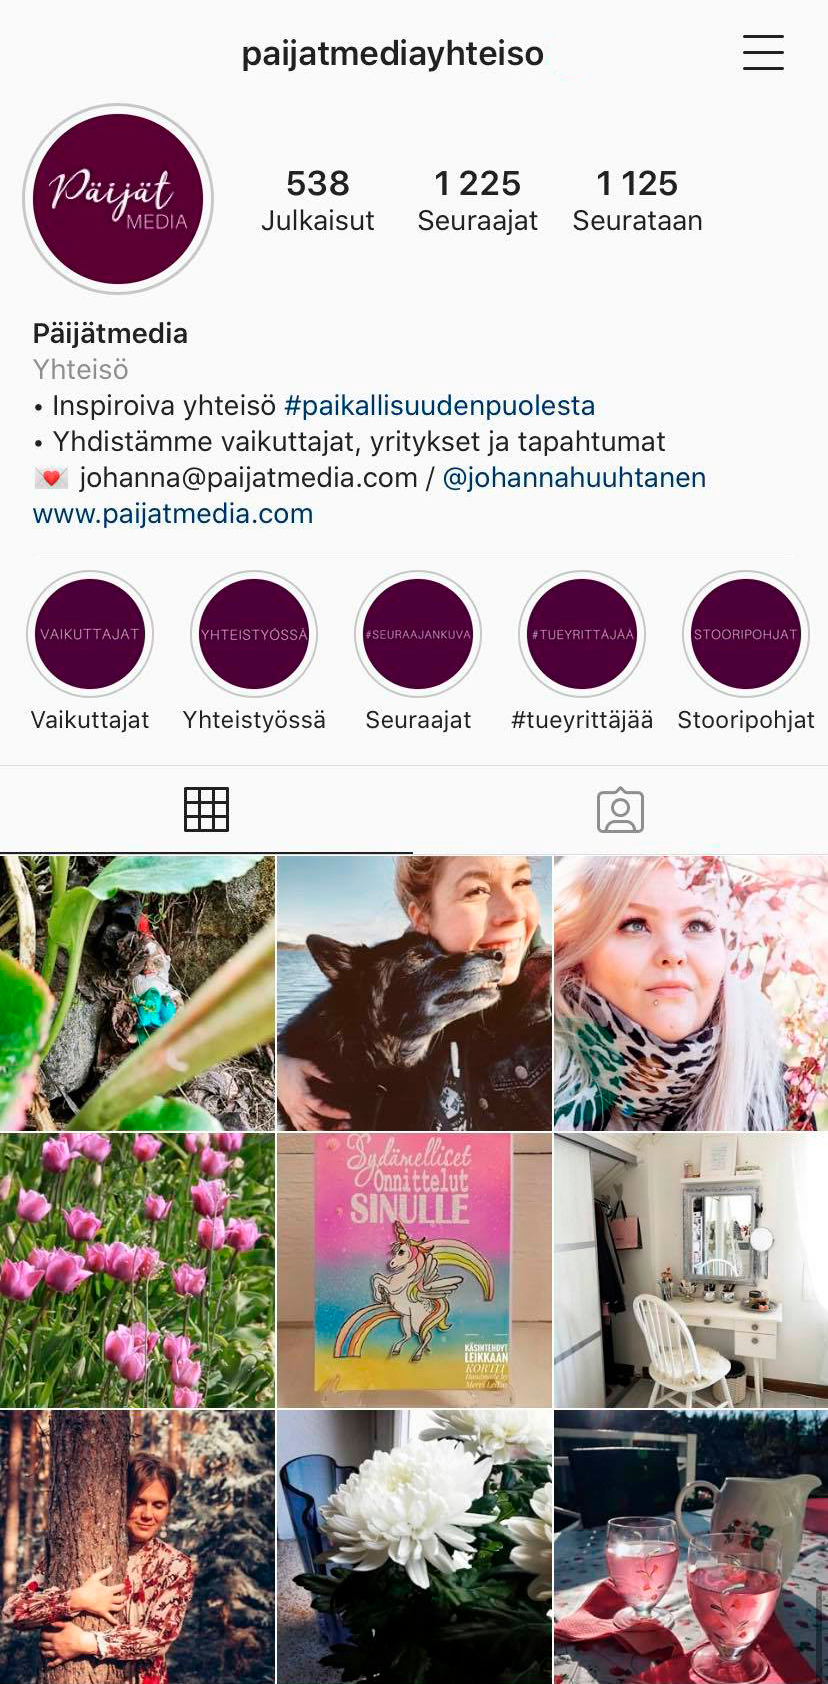 Päijätmedia Instagram